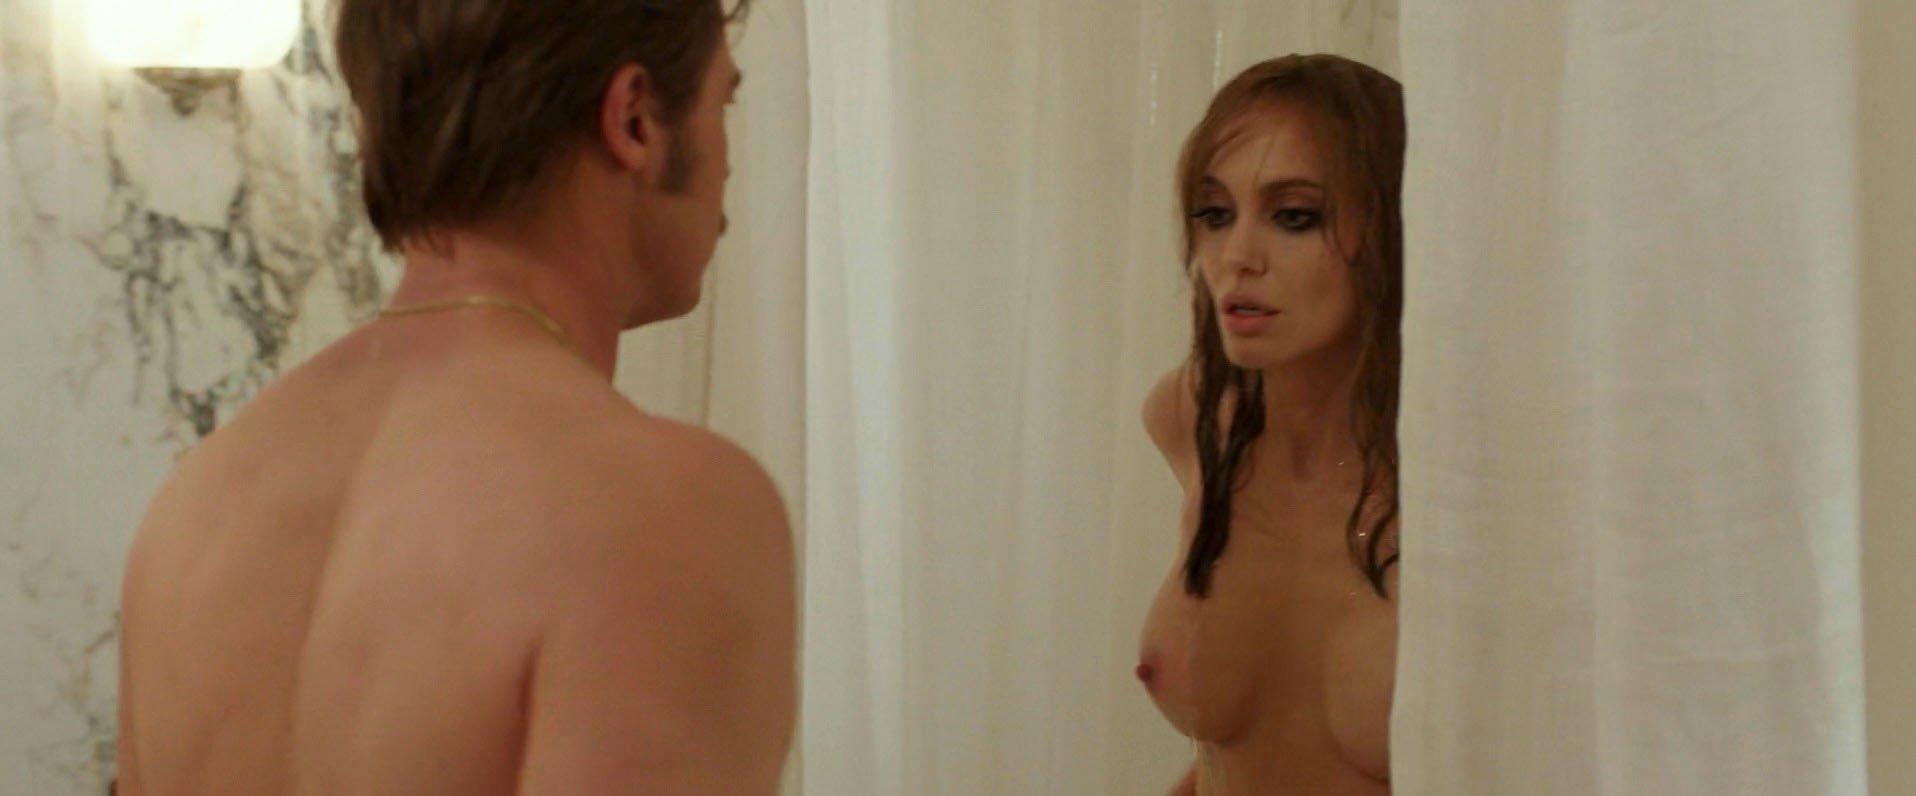 big boob hadjob movies